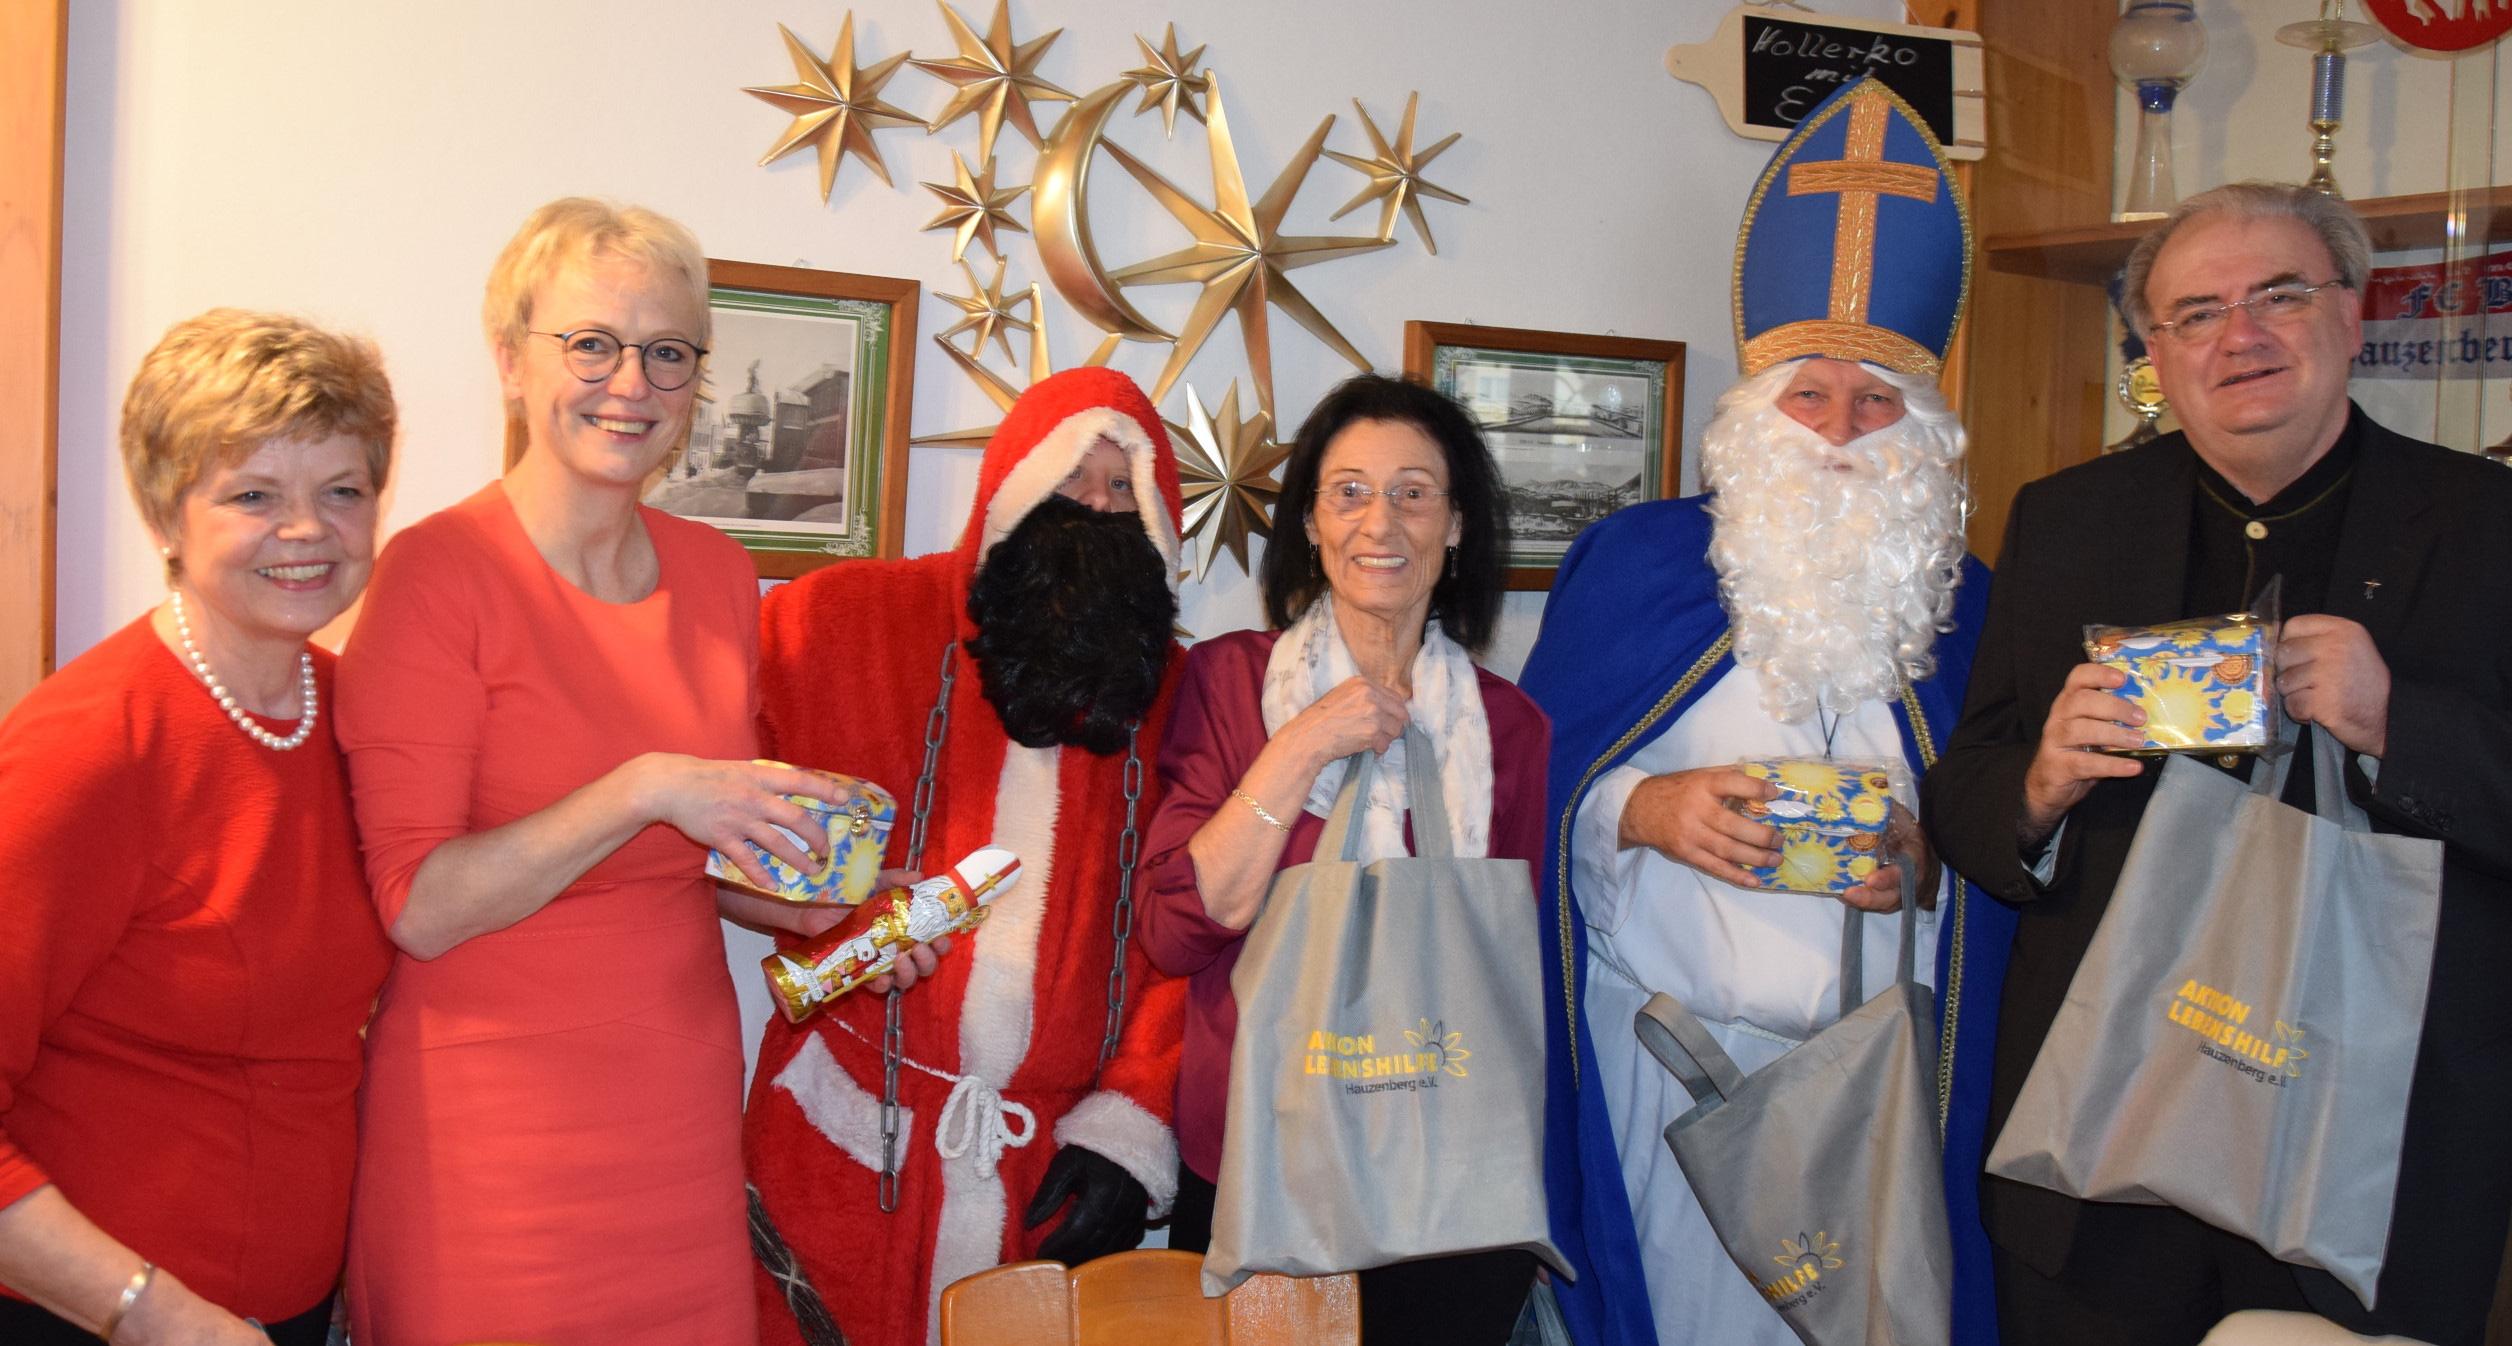 Nikolausfeier der Aktion Lebenshilfe Hauzenberg